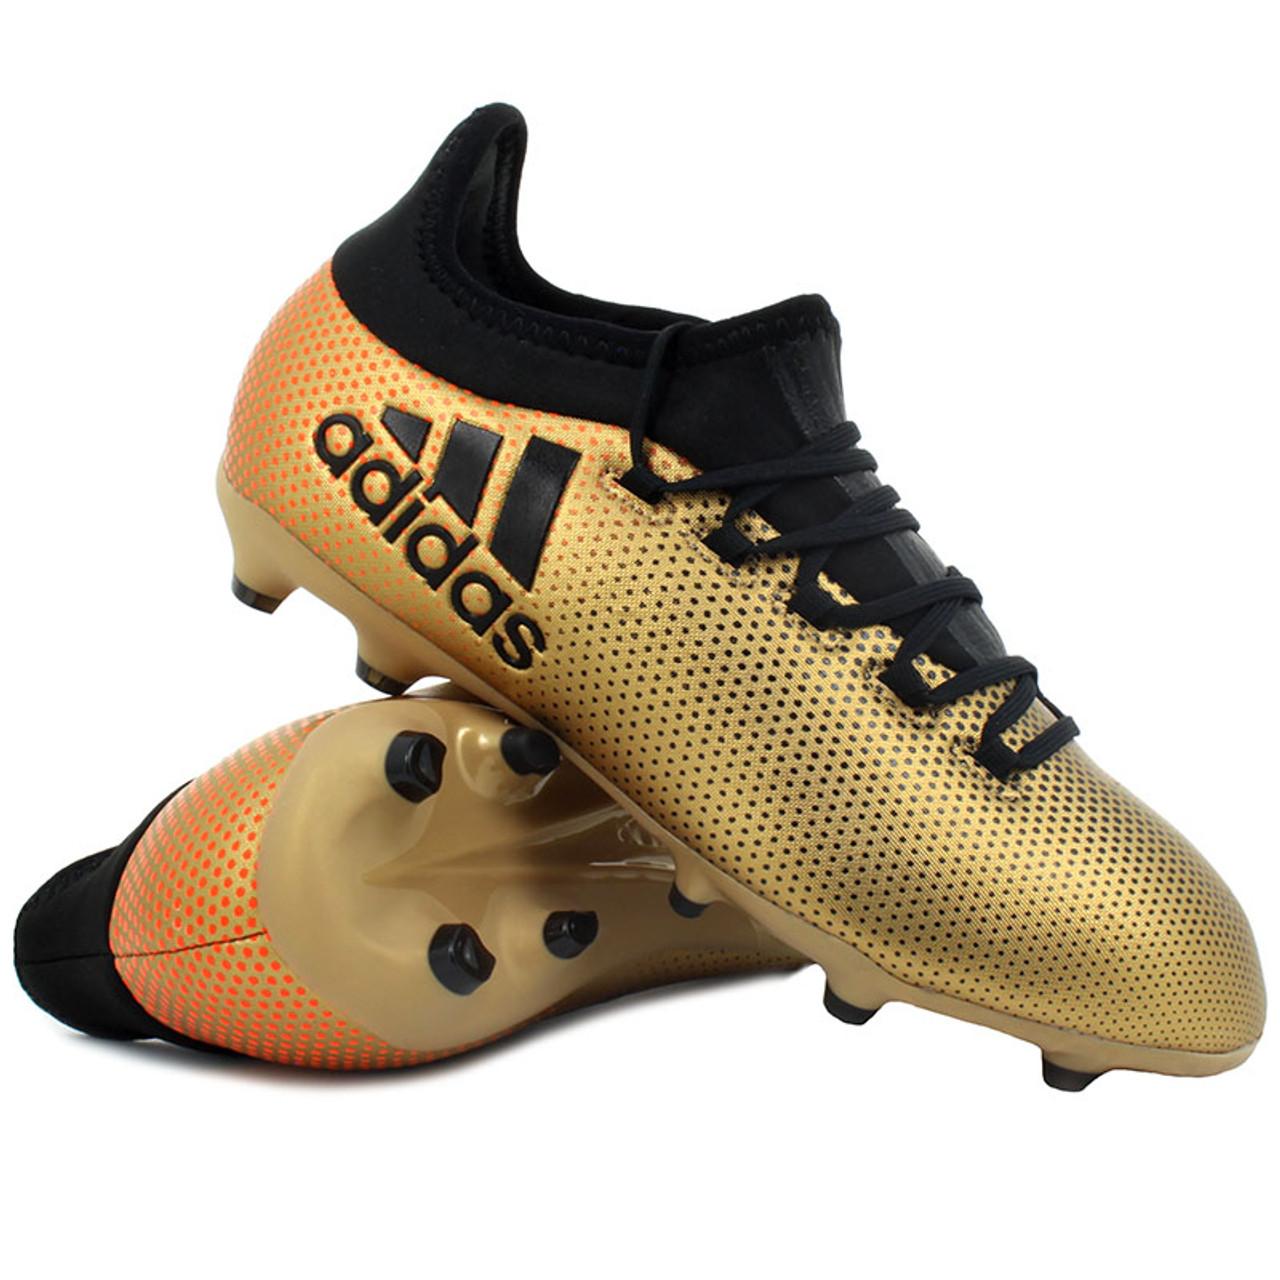 newest collection da207 571db ADIDAS X 17.1 FG J Gold - Soccer Plus